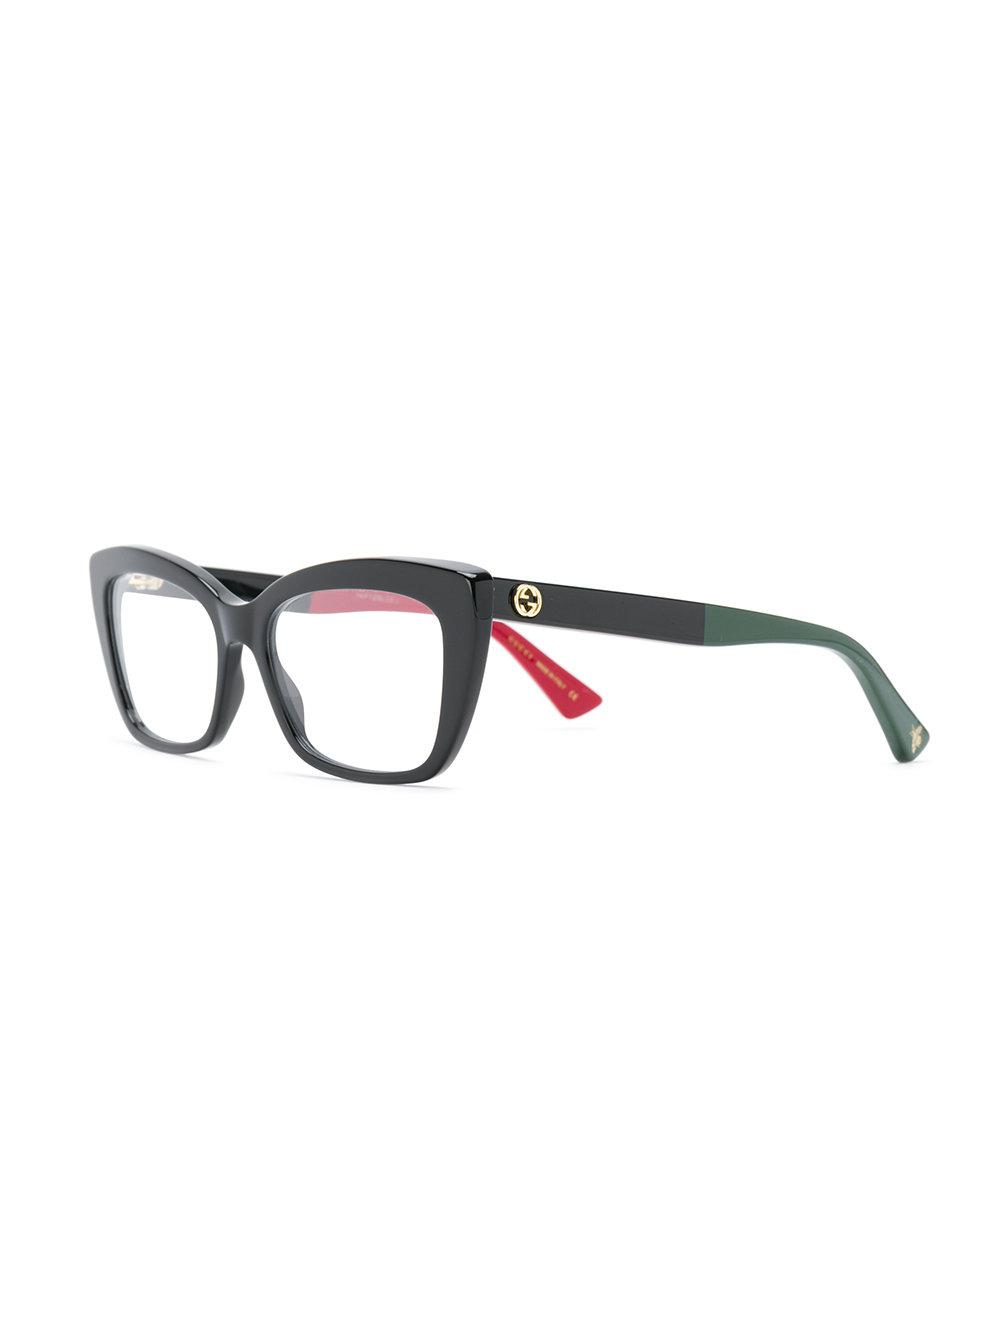 305104d708 Lyst - Gucci Cat-eye Glasses in Black